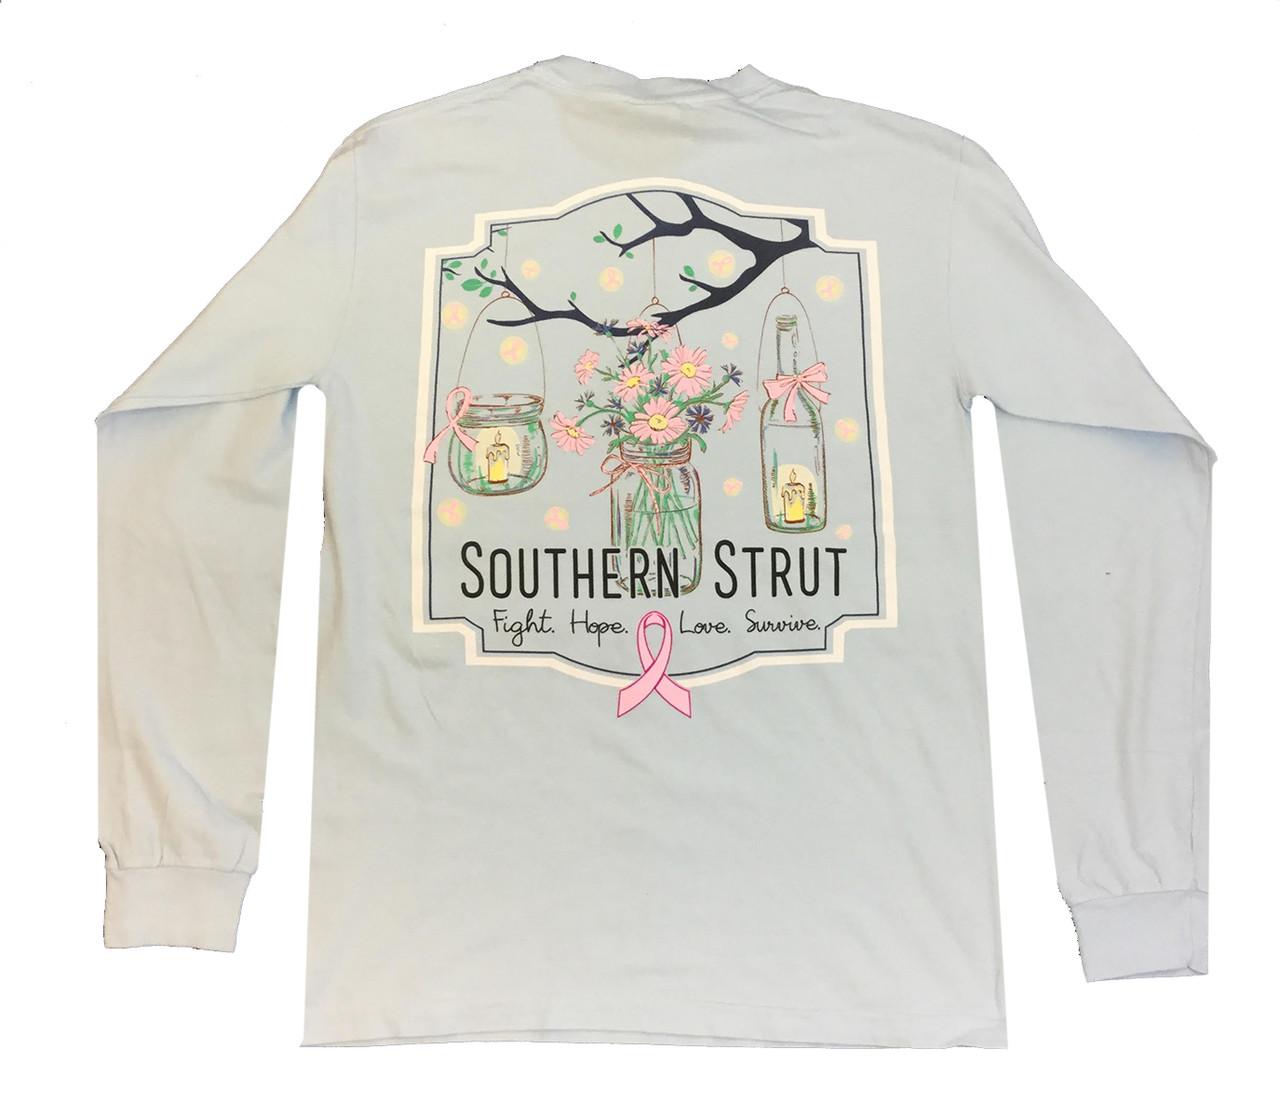 edb4f9227e9 Southern Strut Breast Cancer Awareness Mason Jars Adult Long Sleeve T-shirt  - Trenz Shirt Company